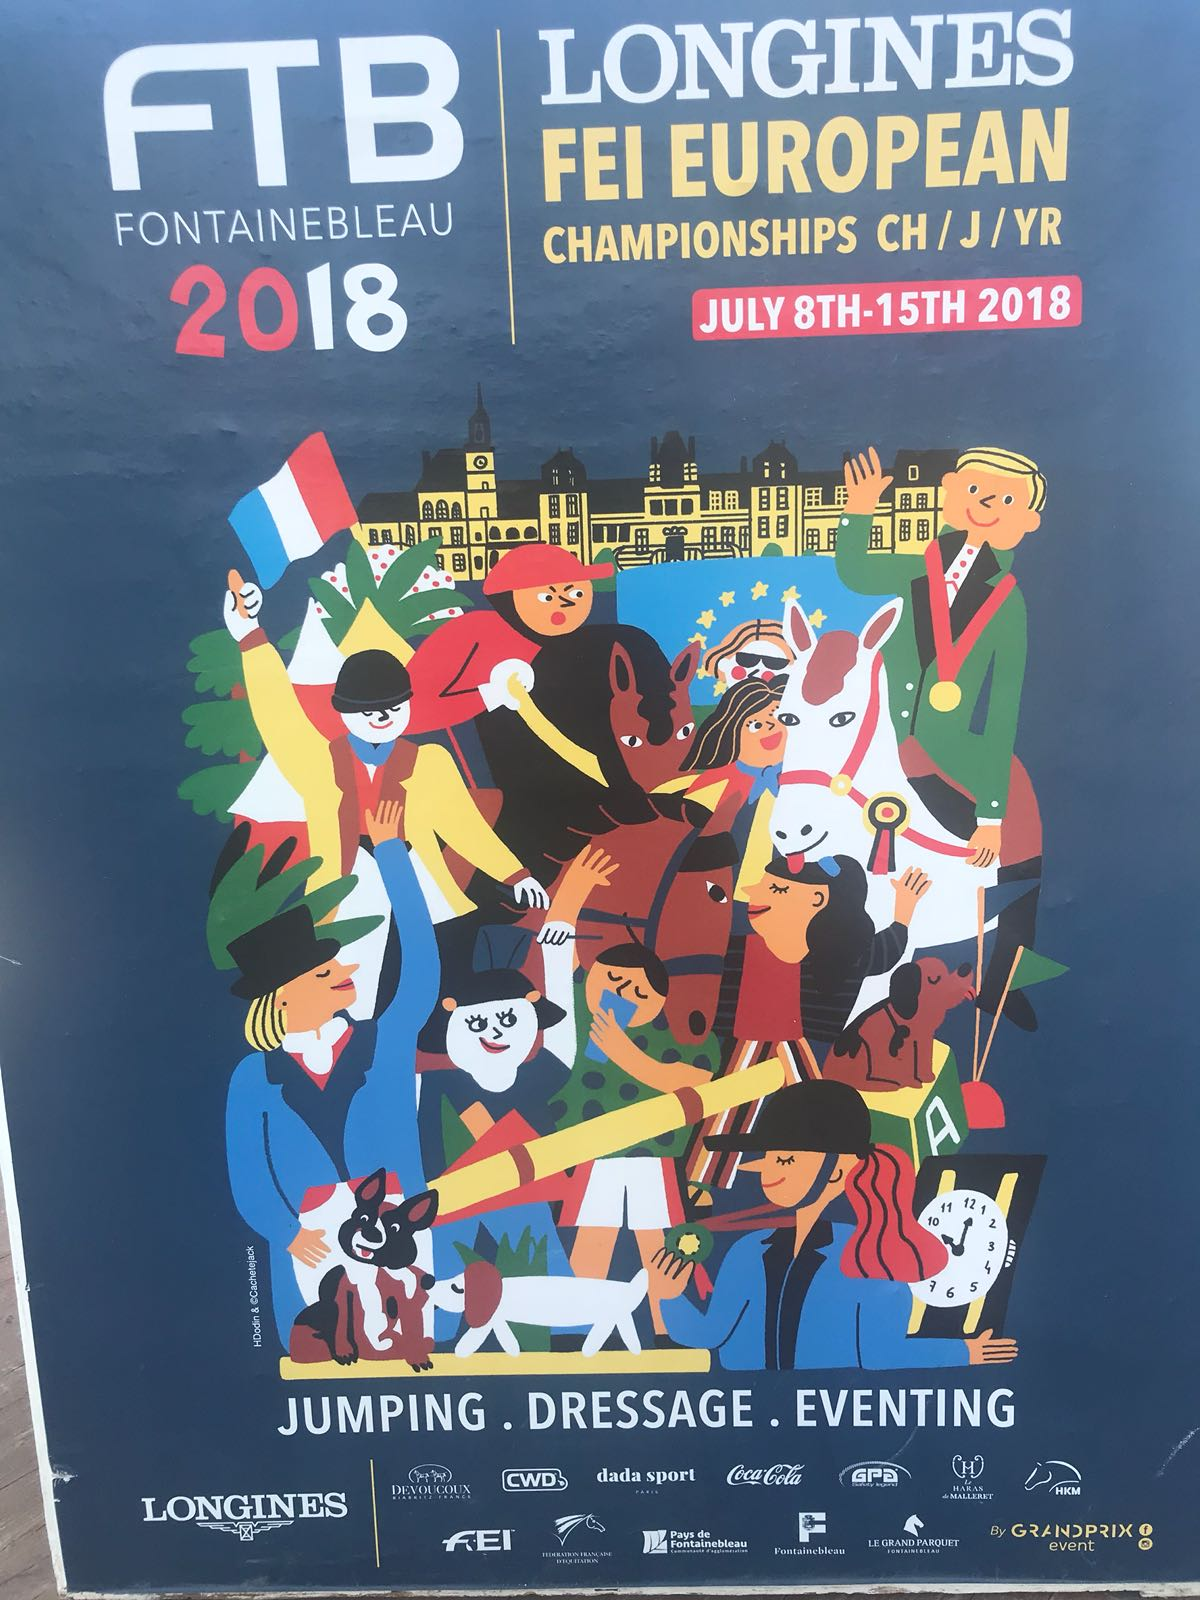 fontainebleau-eu-ch-2018-CARTEL